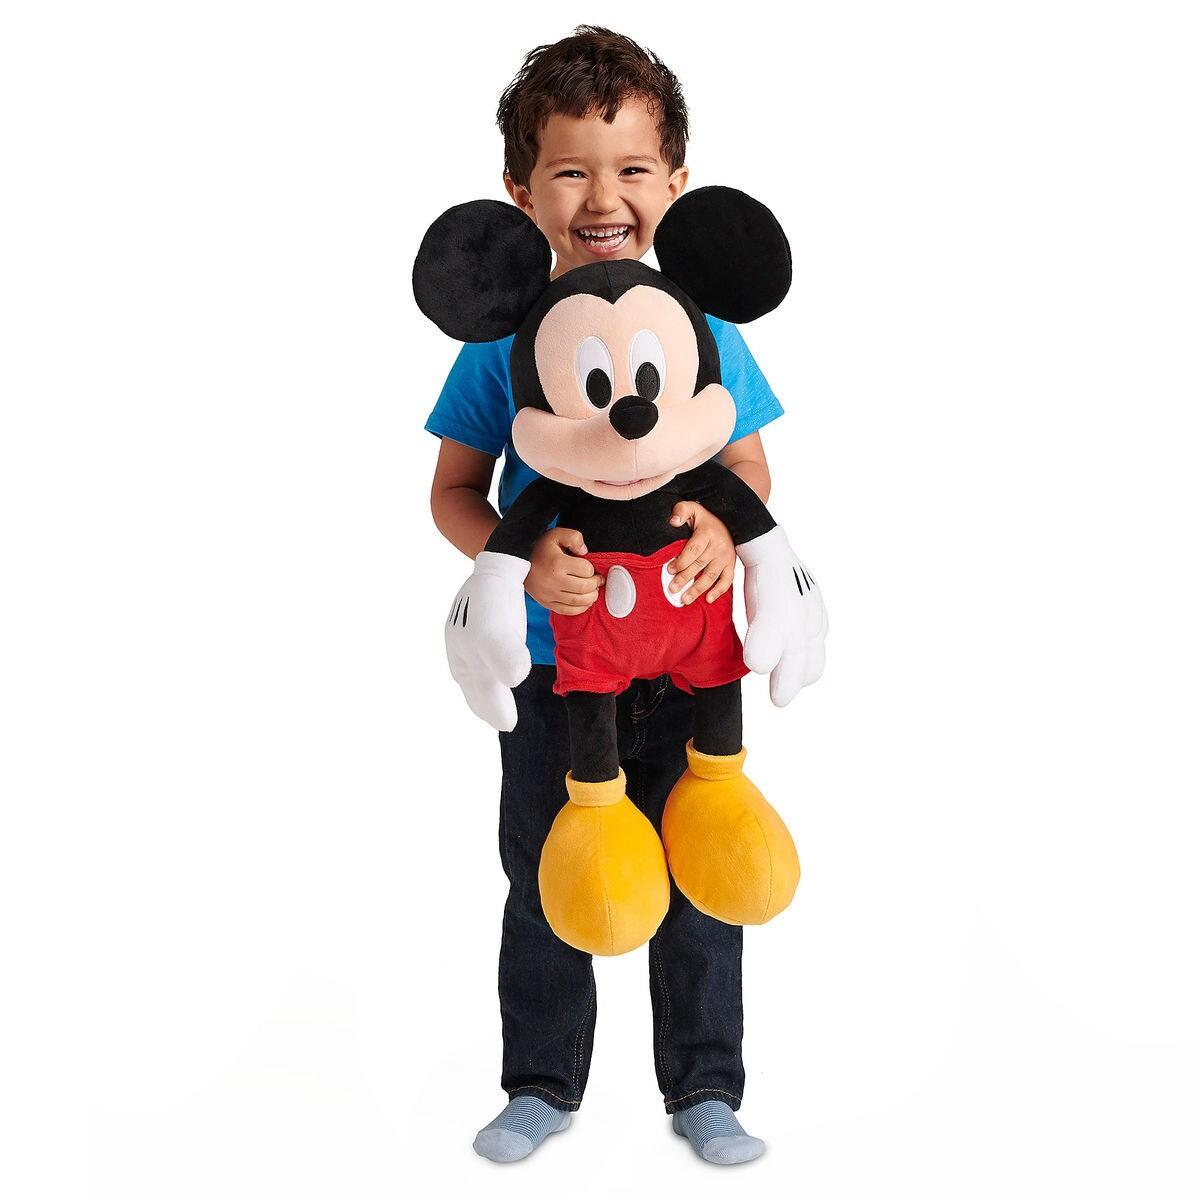 Mickey Mouse Plush Large Shopdisney